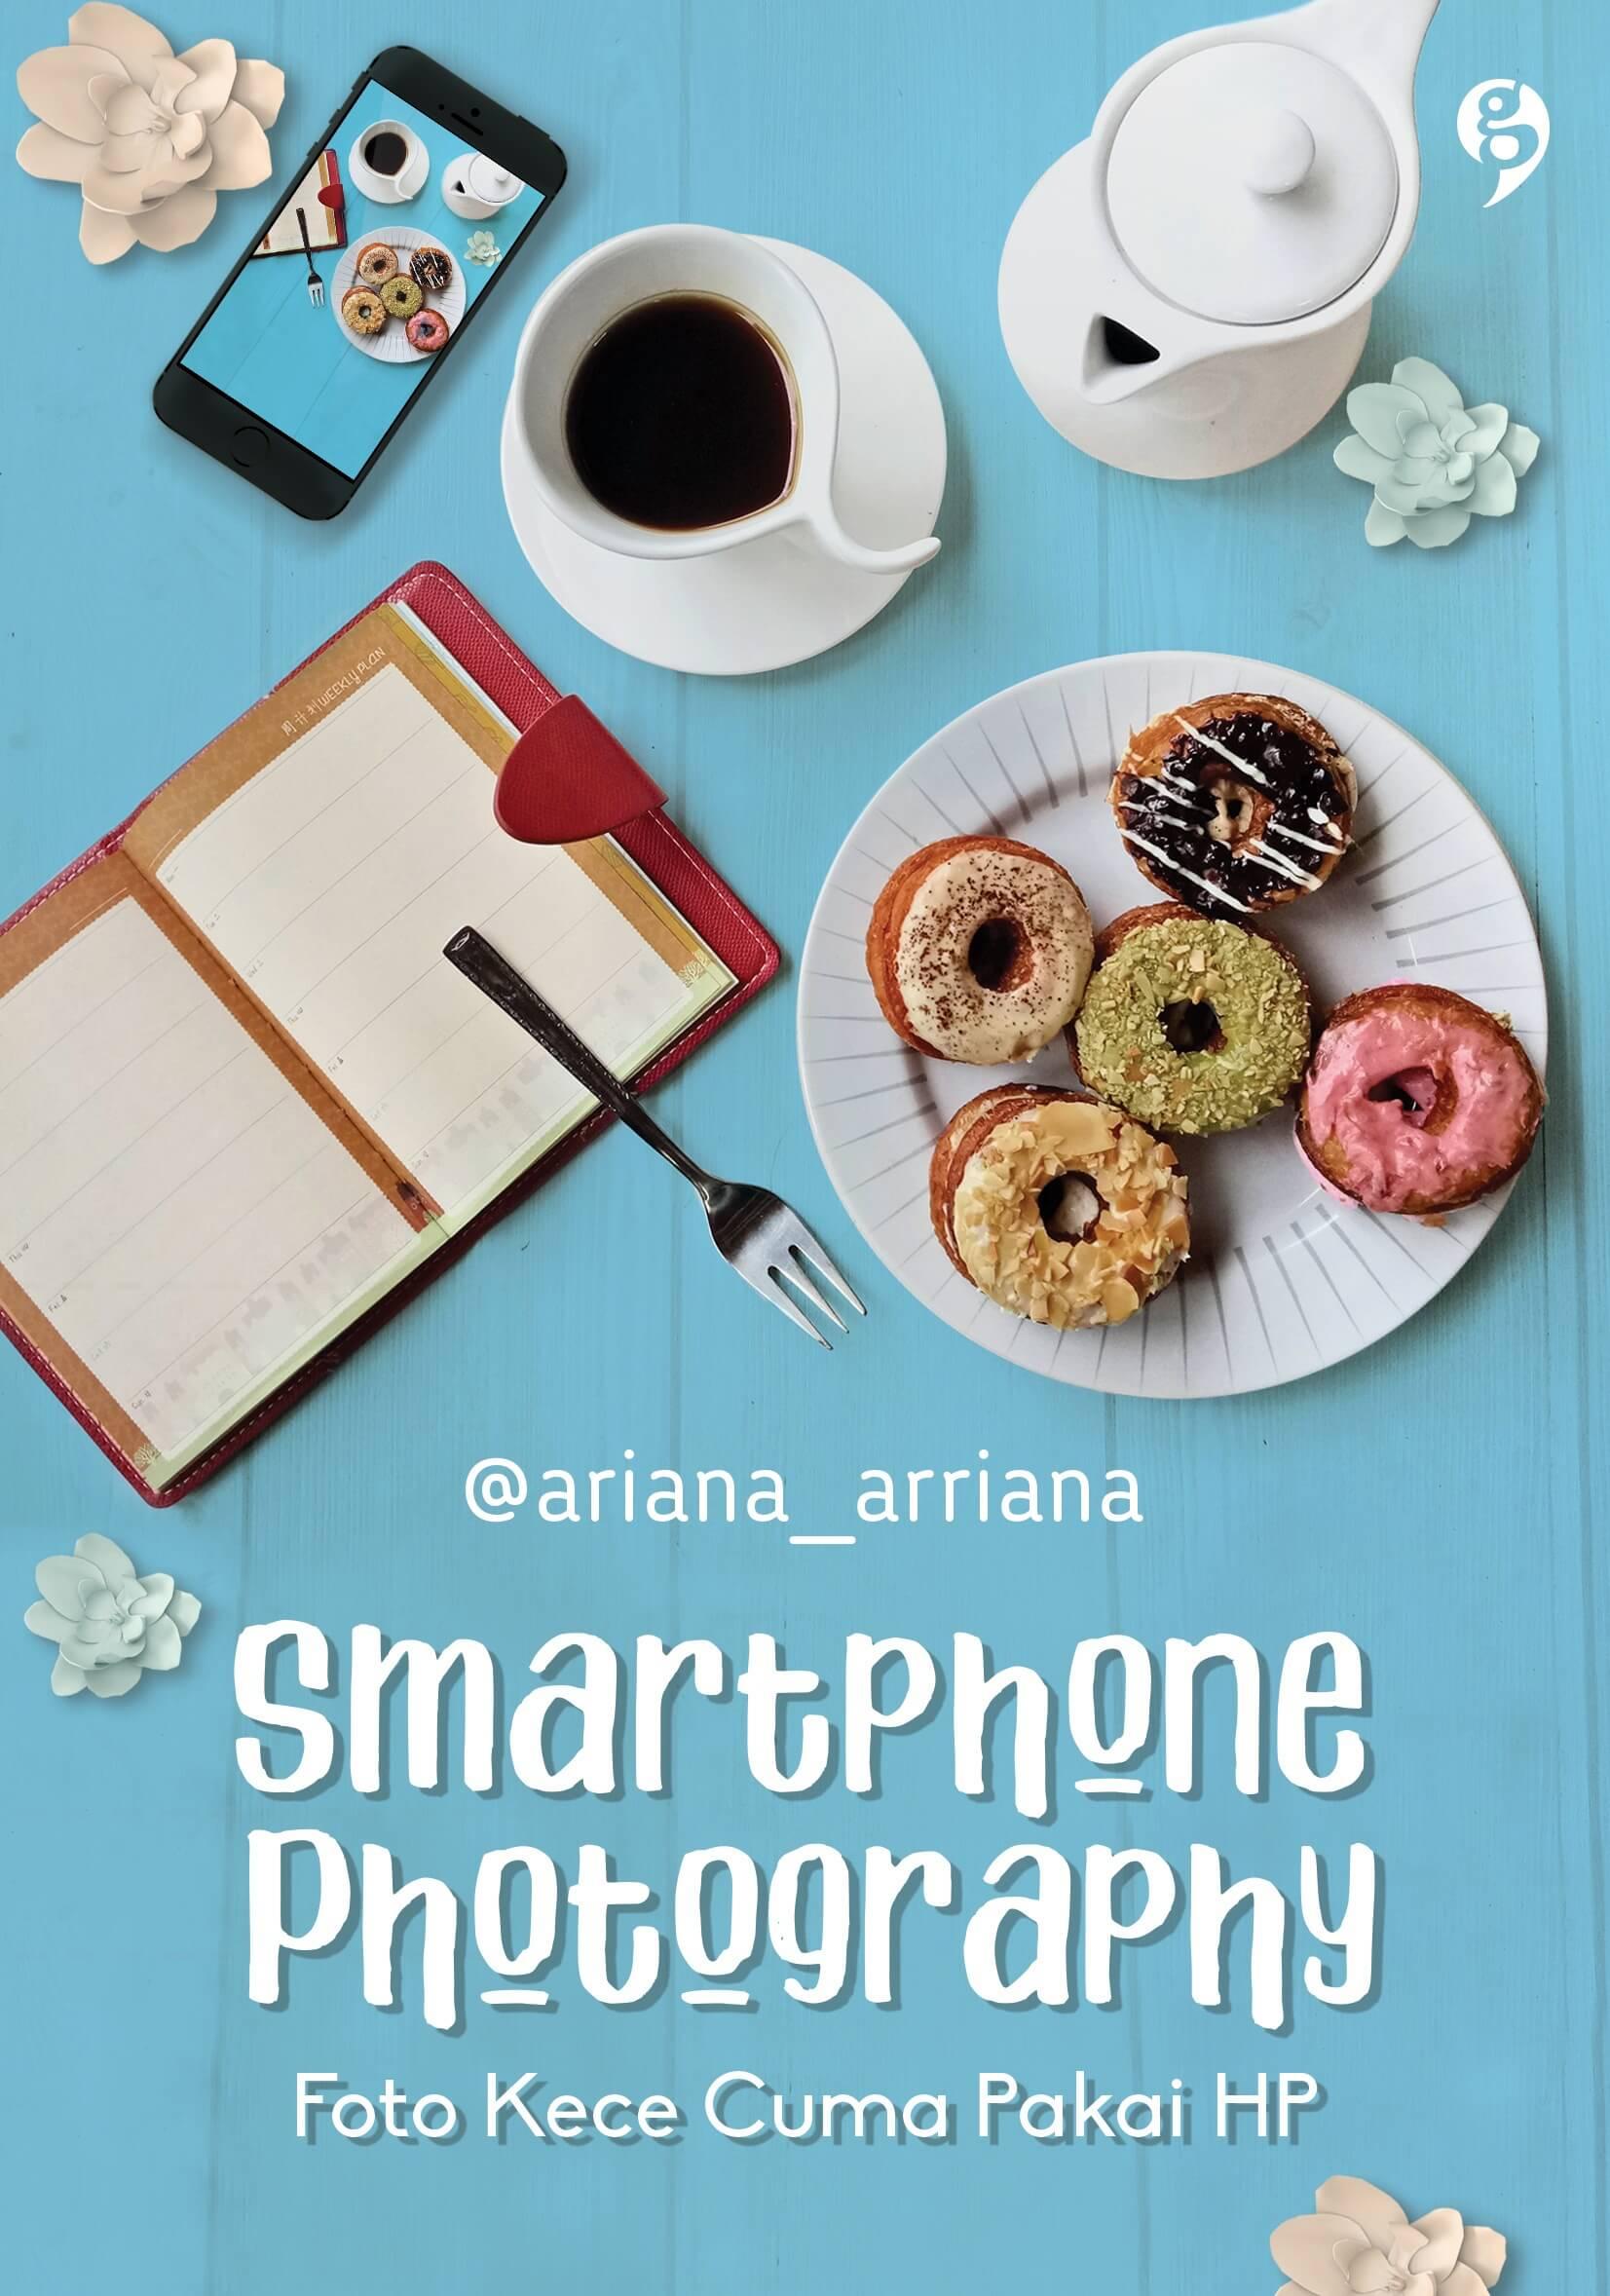 SMARTPHONE PHOTOGRAPHY [ARIANA]